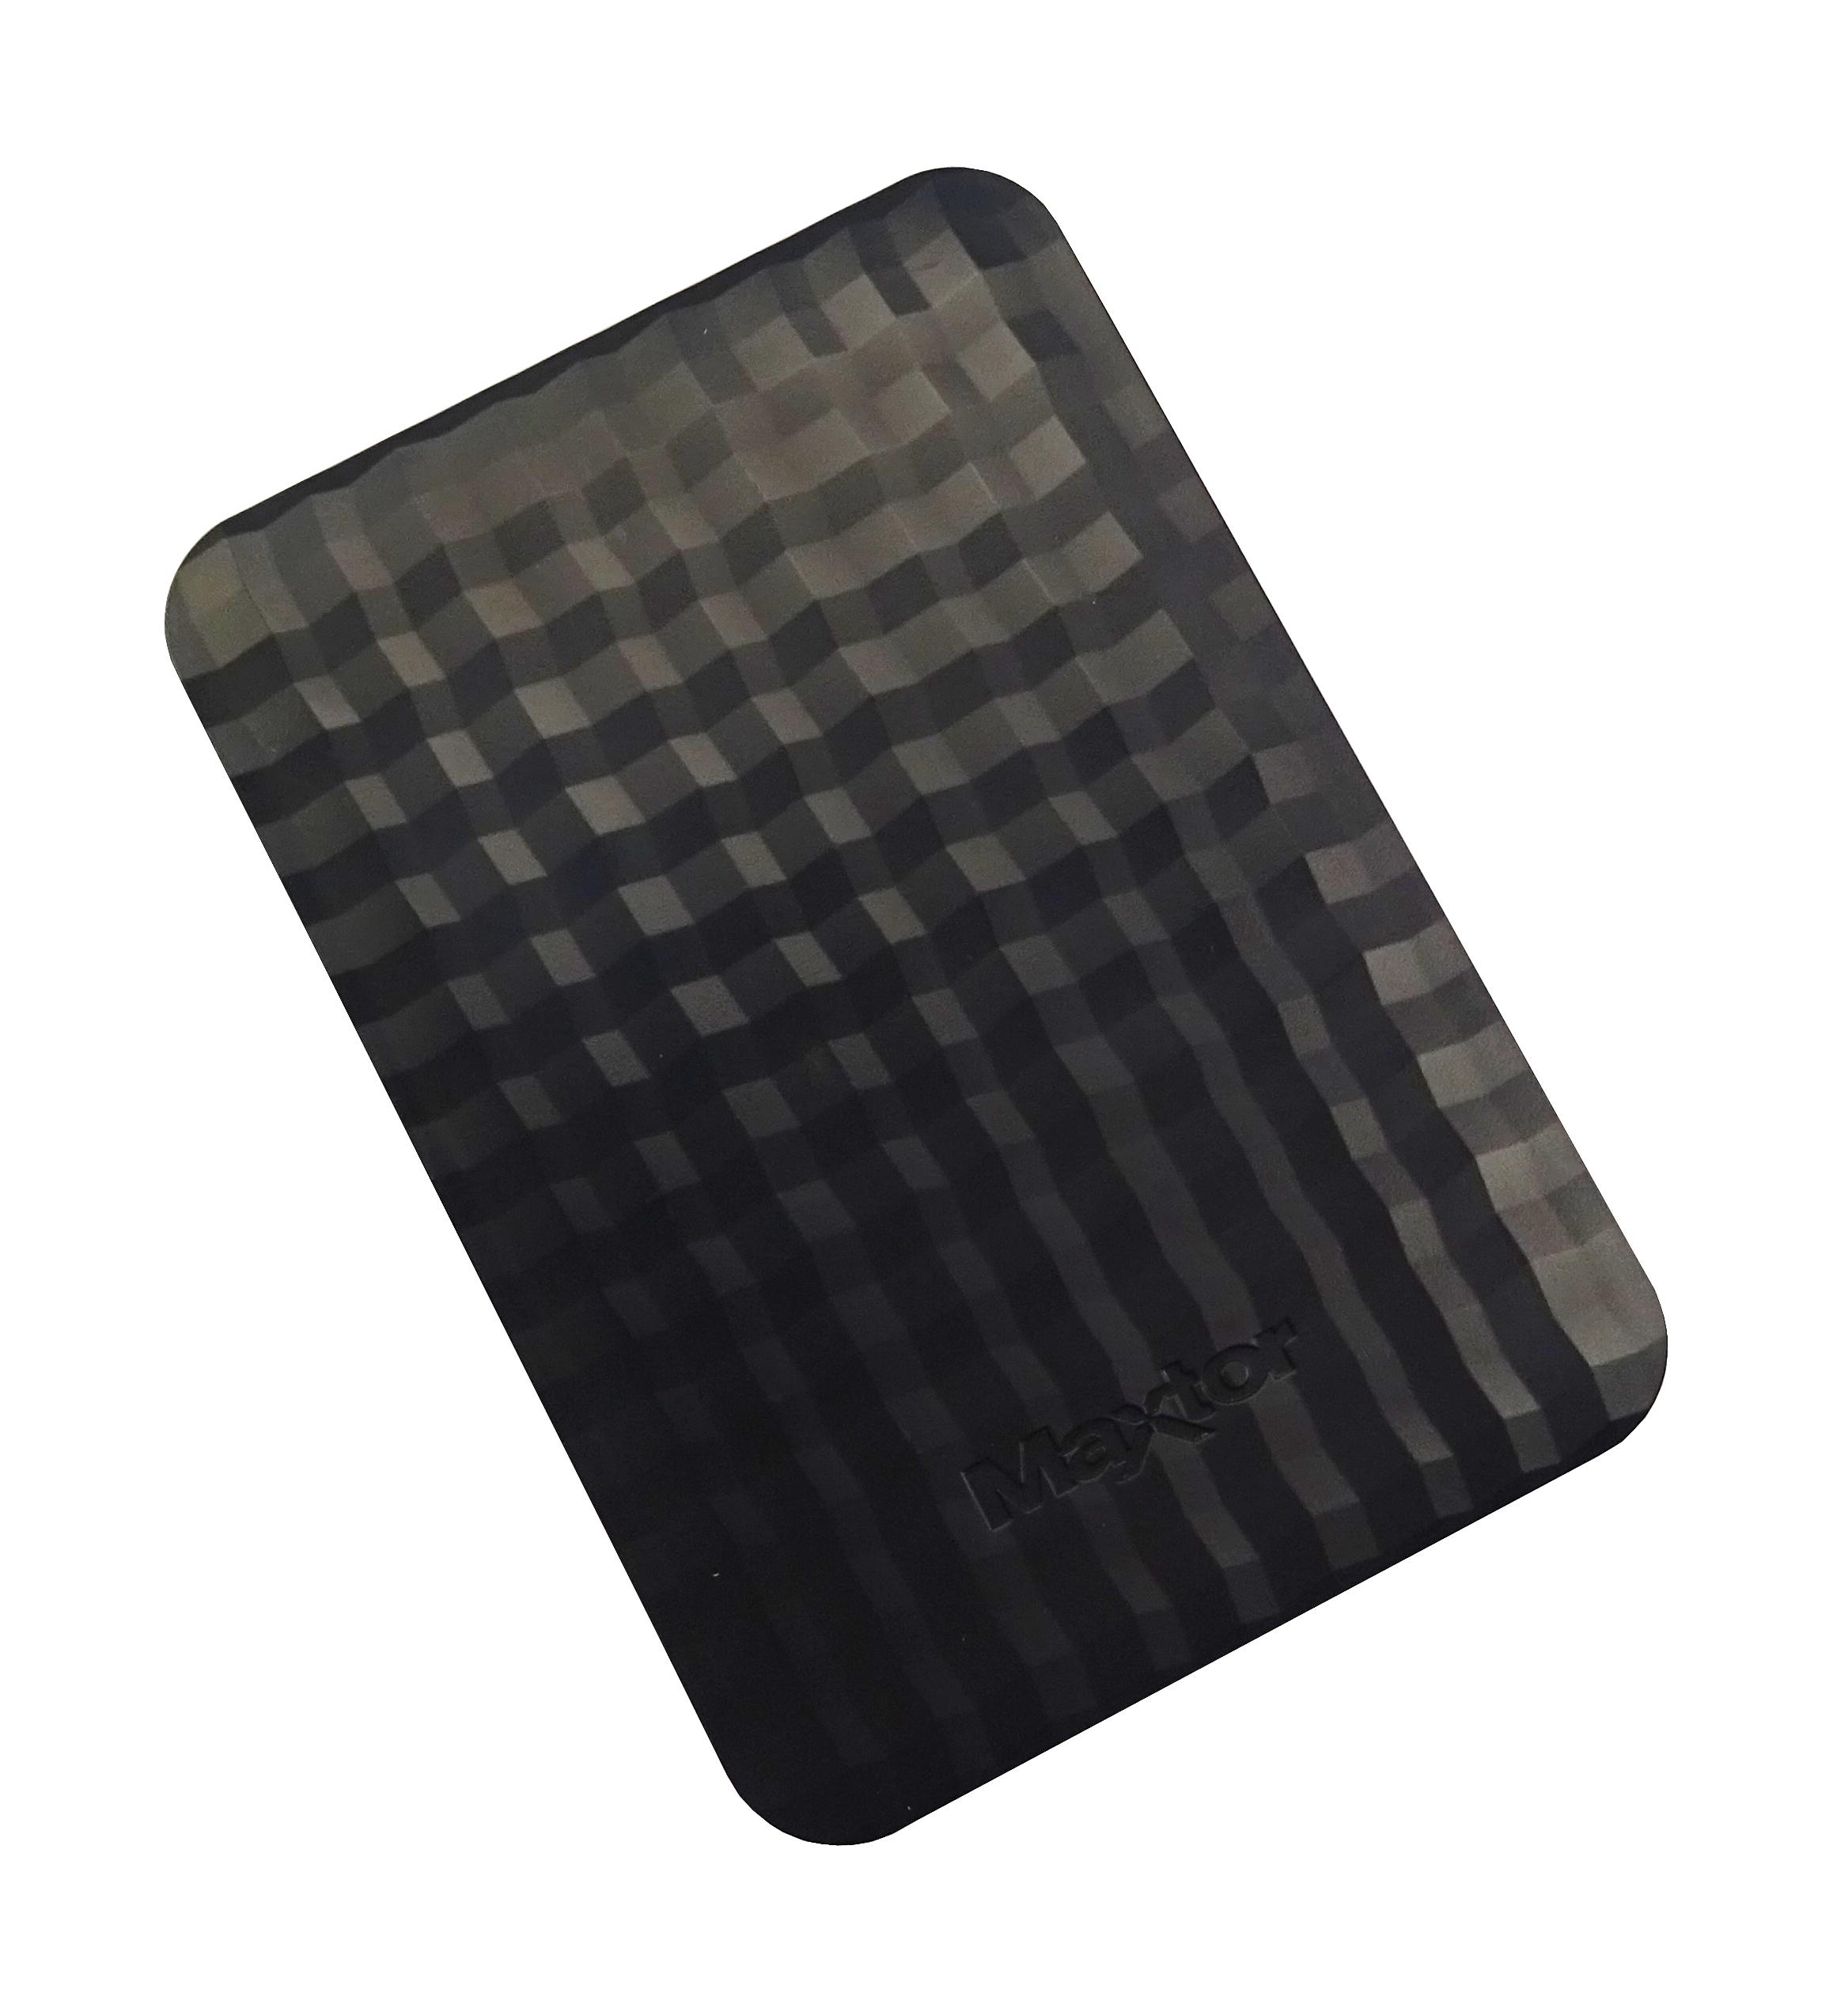 Maxtor M3 Portable External Hard Drive 2TB Black Used